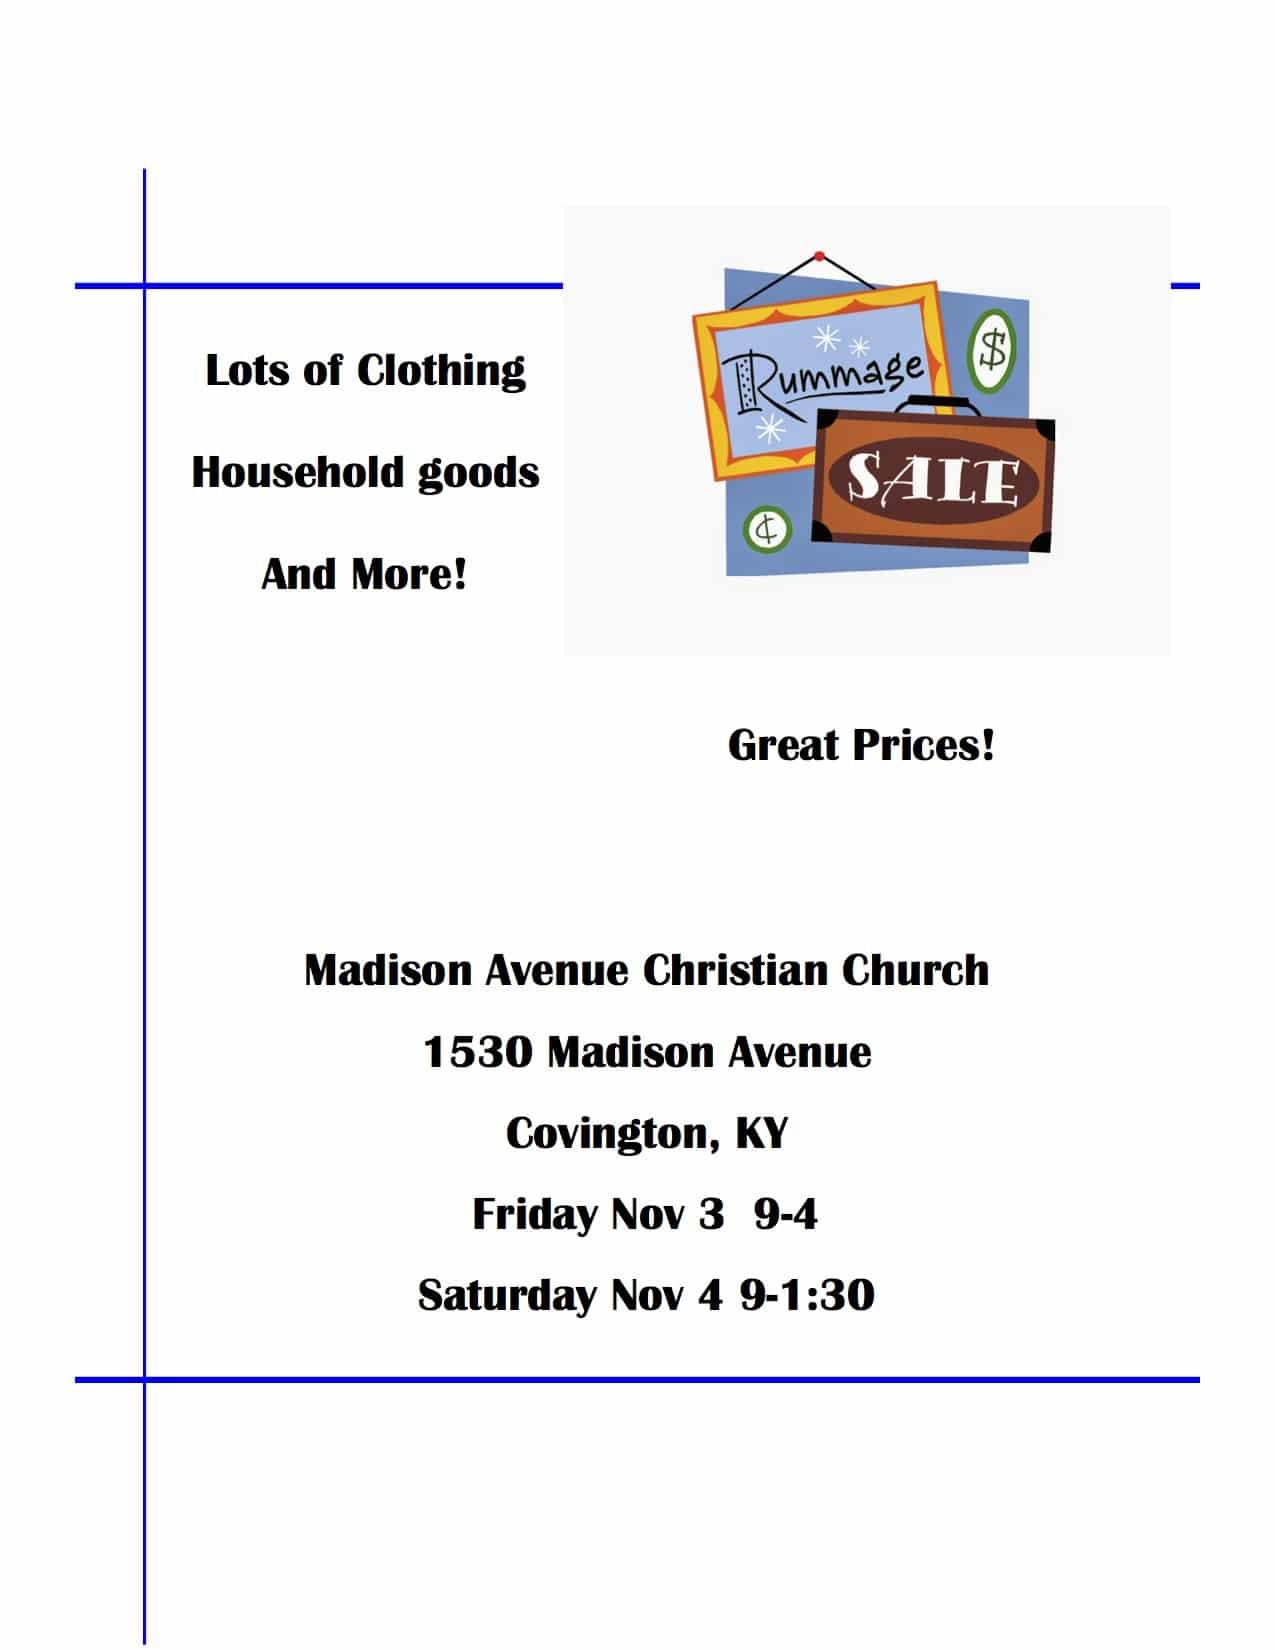 Rummage Sale November 3 & 4th - Madison Avenue Christian Church